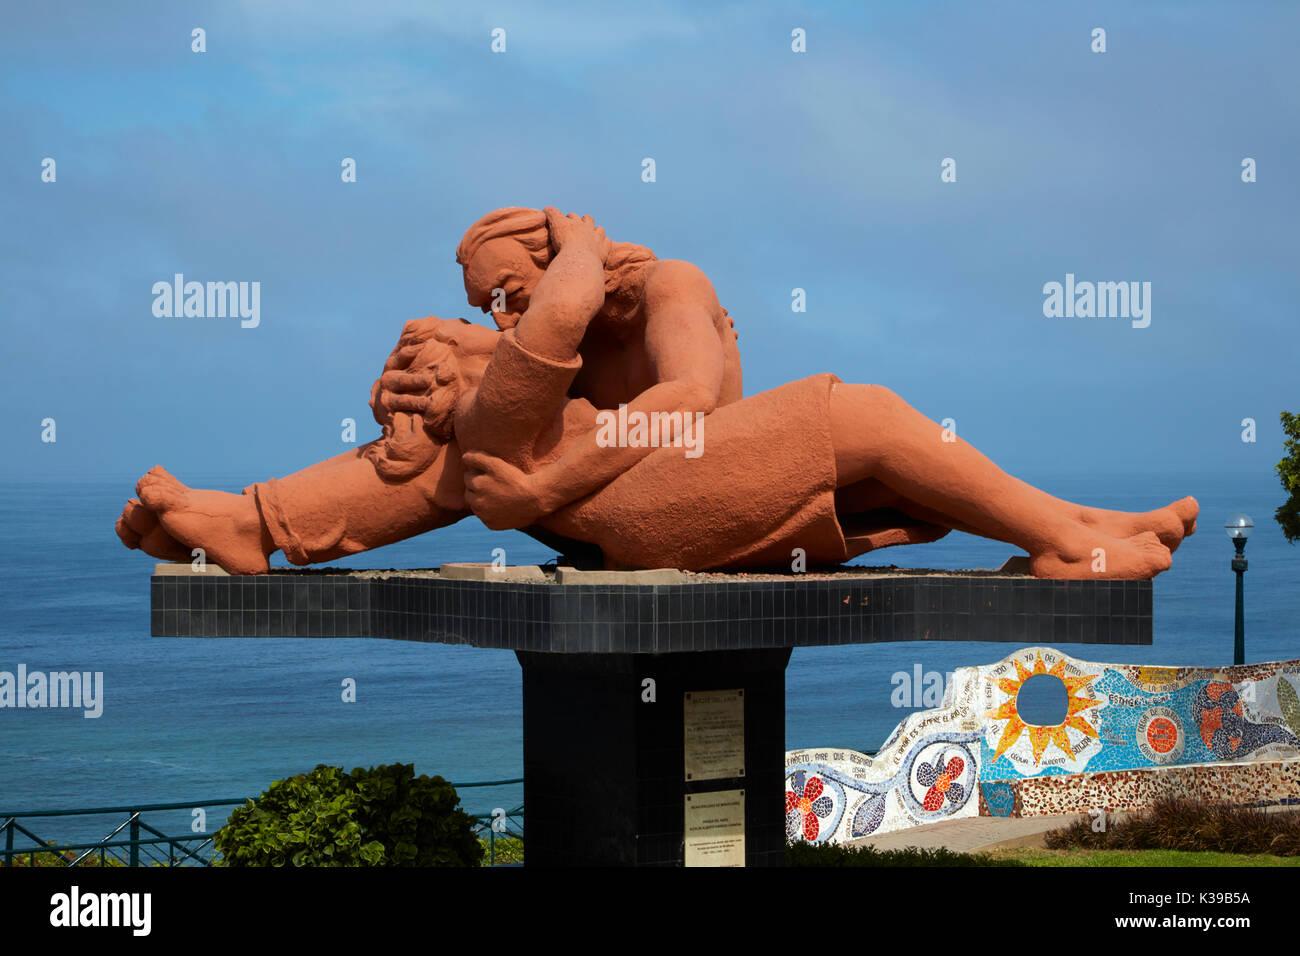 El Beso (The Kiss) statue by Victor Delfin, Park del Amor (Park of Love), Miraflores, Lima, Peru, South America - Stock Image